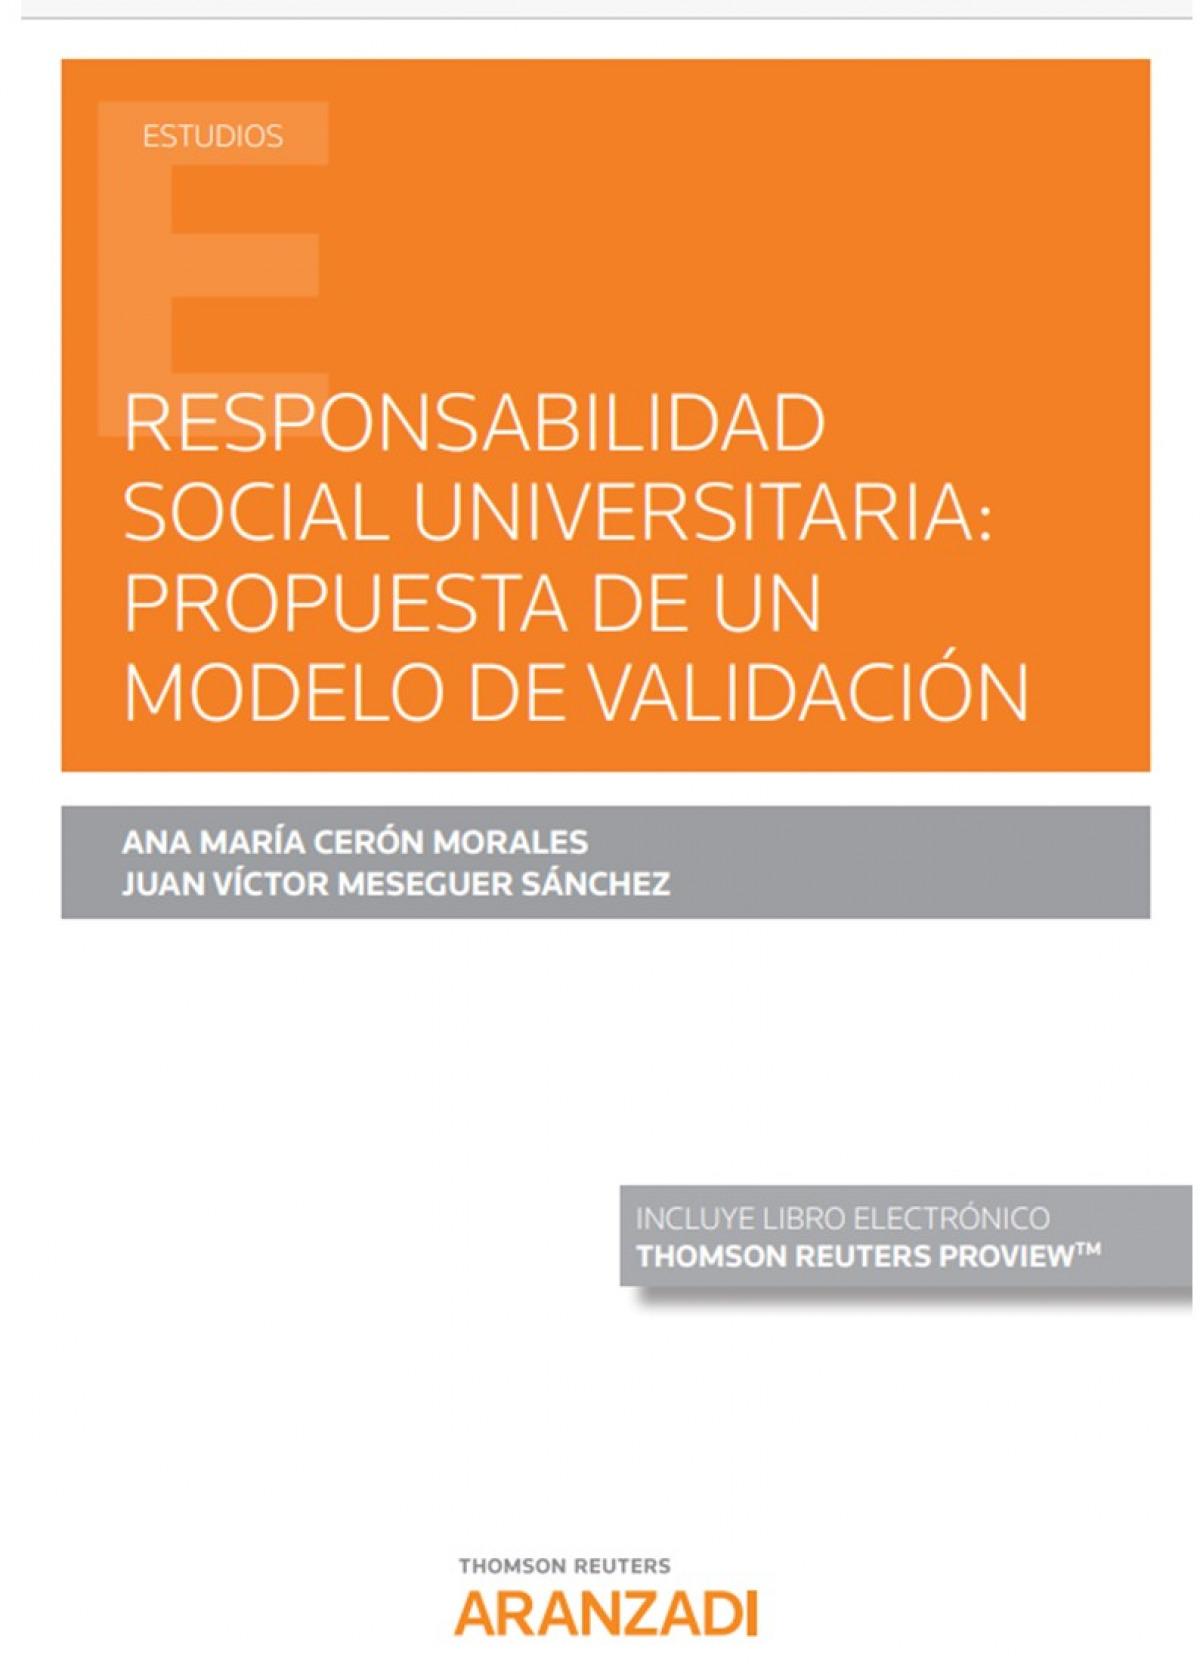 Responsabilidad social universitaria: 9788413453576